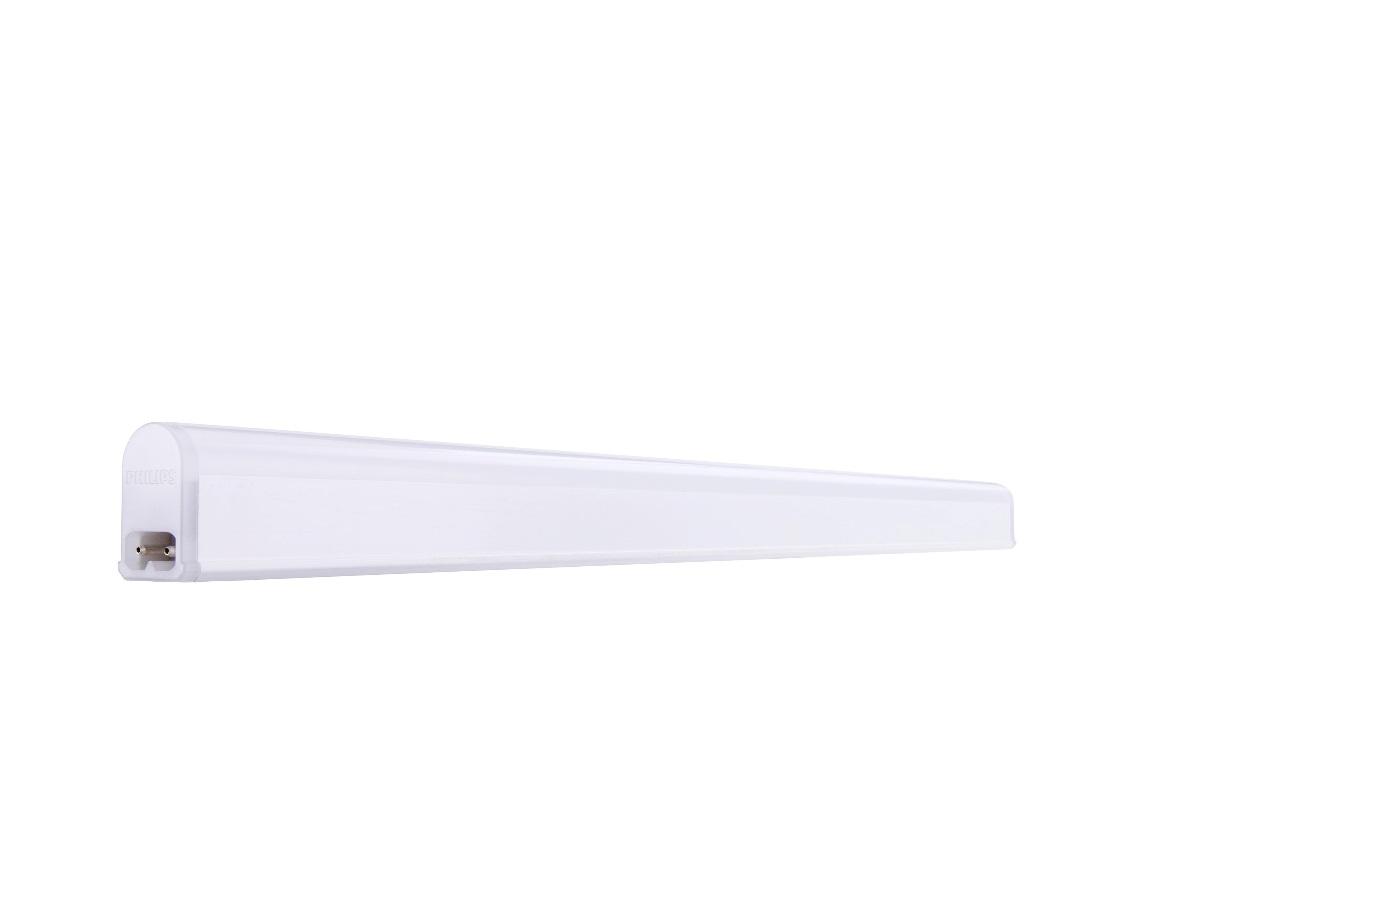 Philips presents Essential SmartBright Slim LED ideal